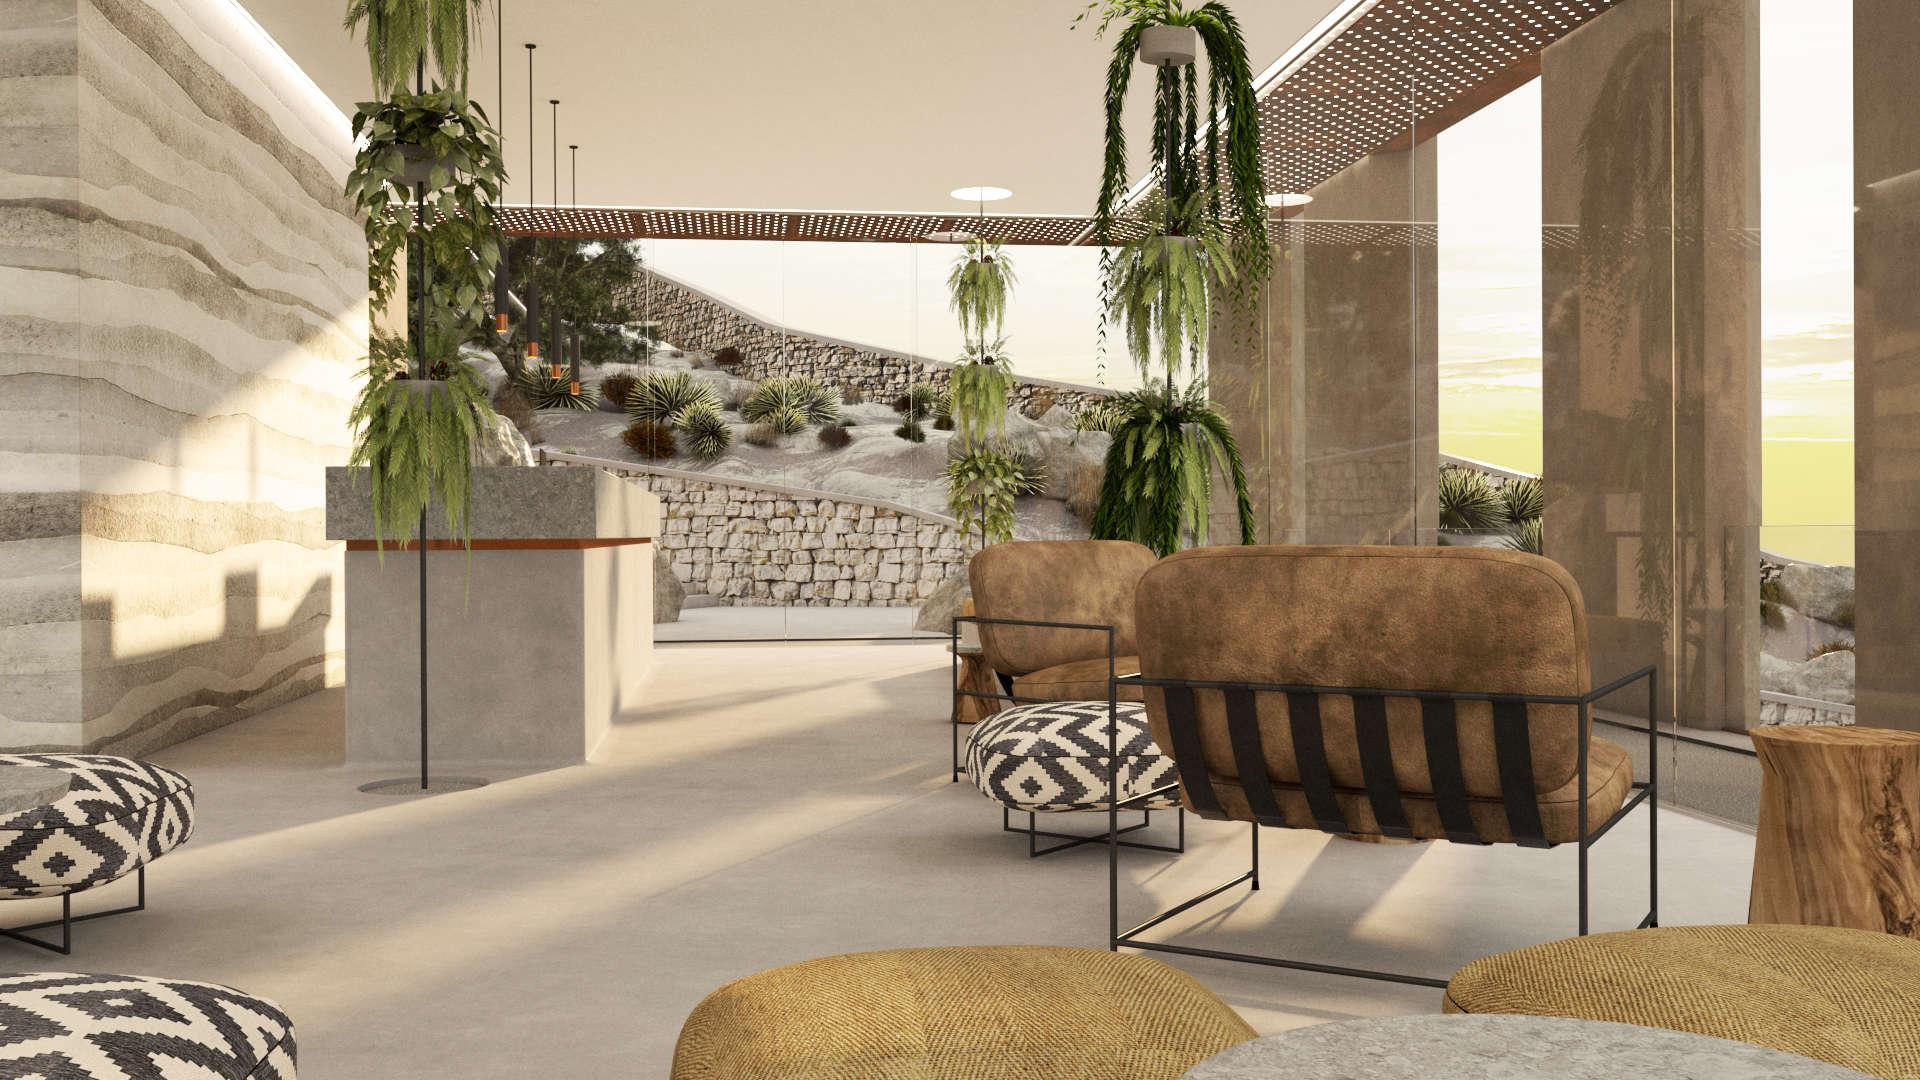 Reception and lobby interior design, rammed earth wall, view. Εσωτερικός χώρος της Ρεσεψιόν και της αίθουσας αναμονής. Τοίχος με την τεχνική του rammed earth, Θέα της εξωτερικής διαμόρφωσης.